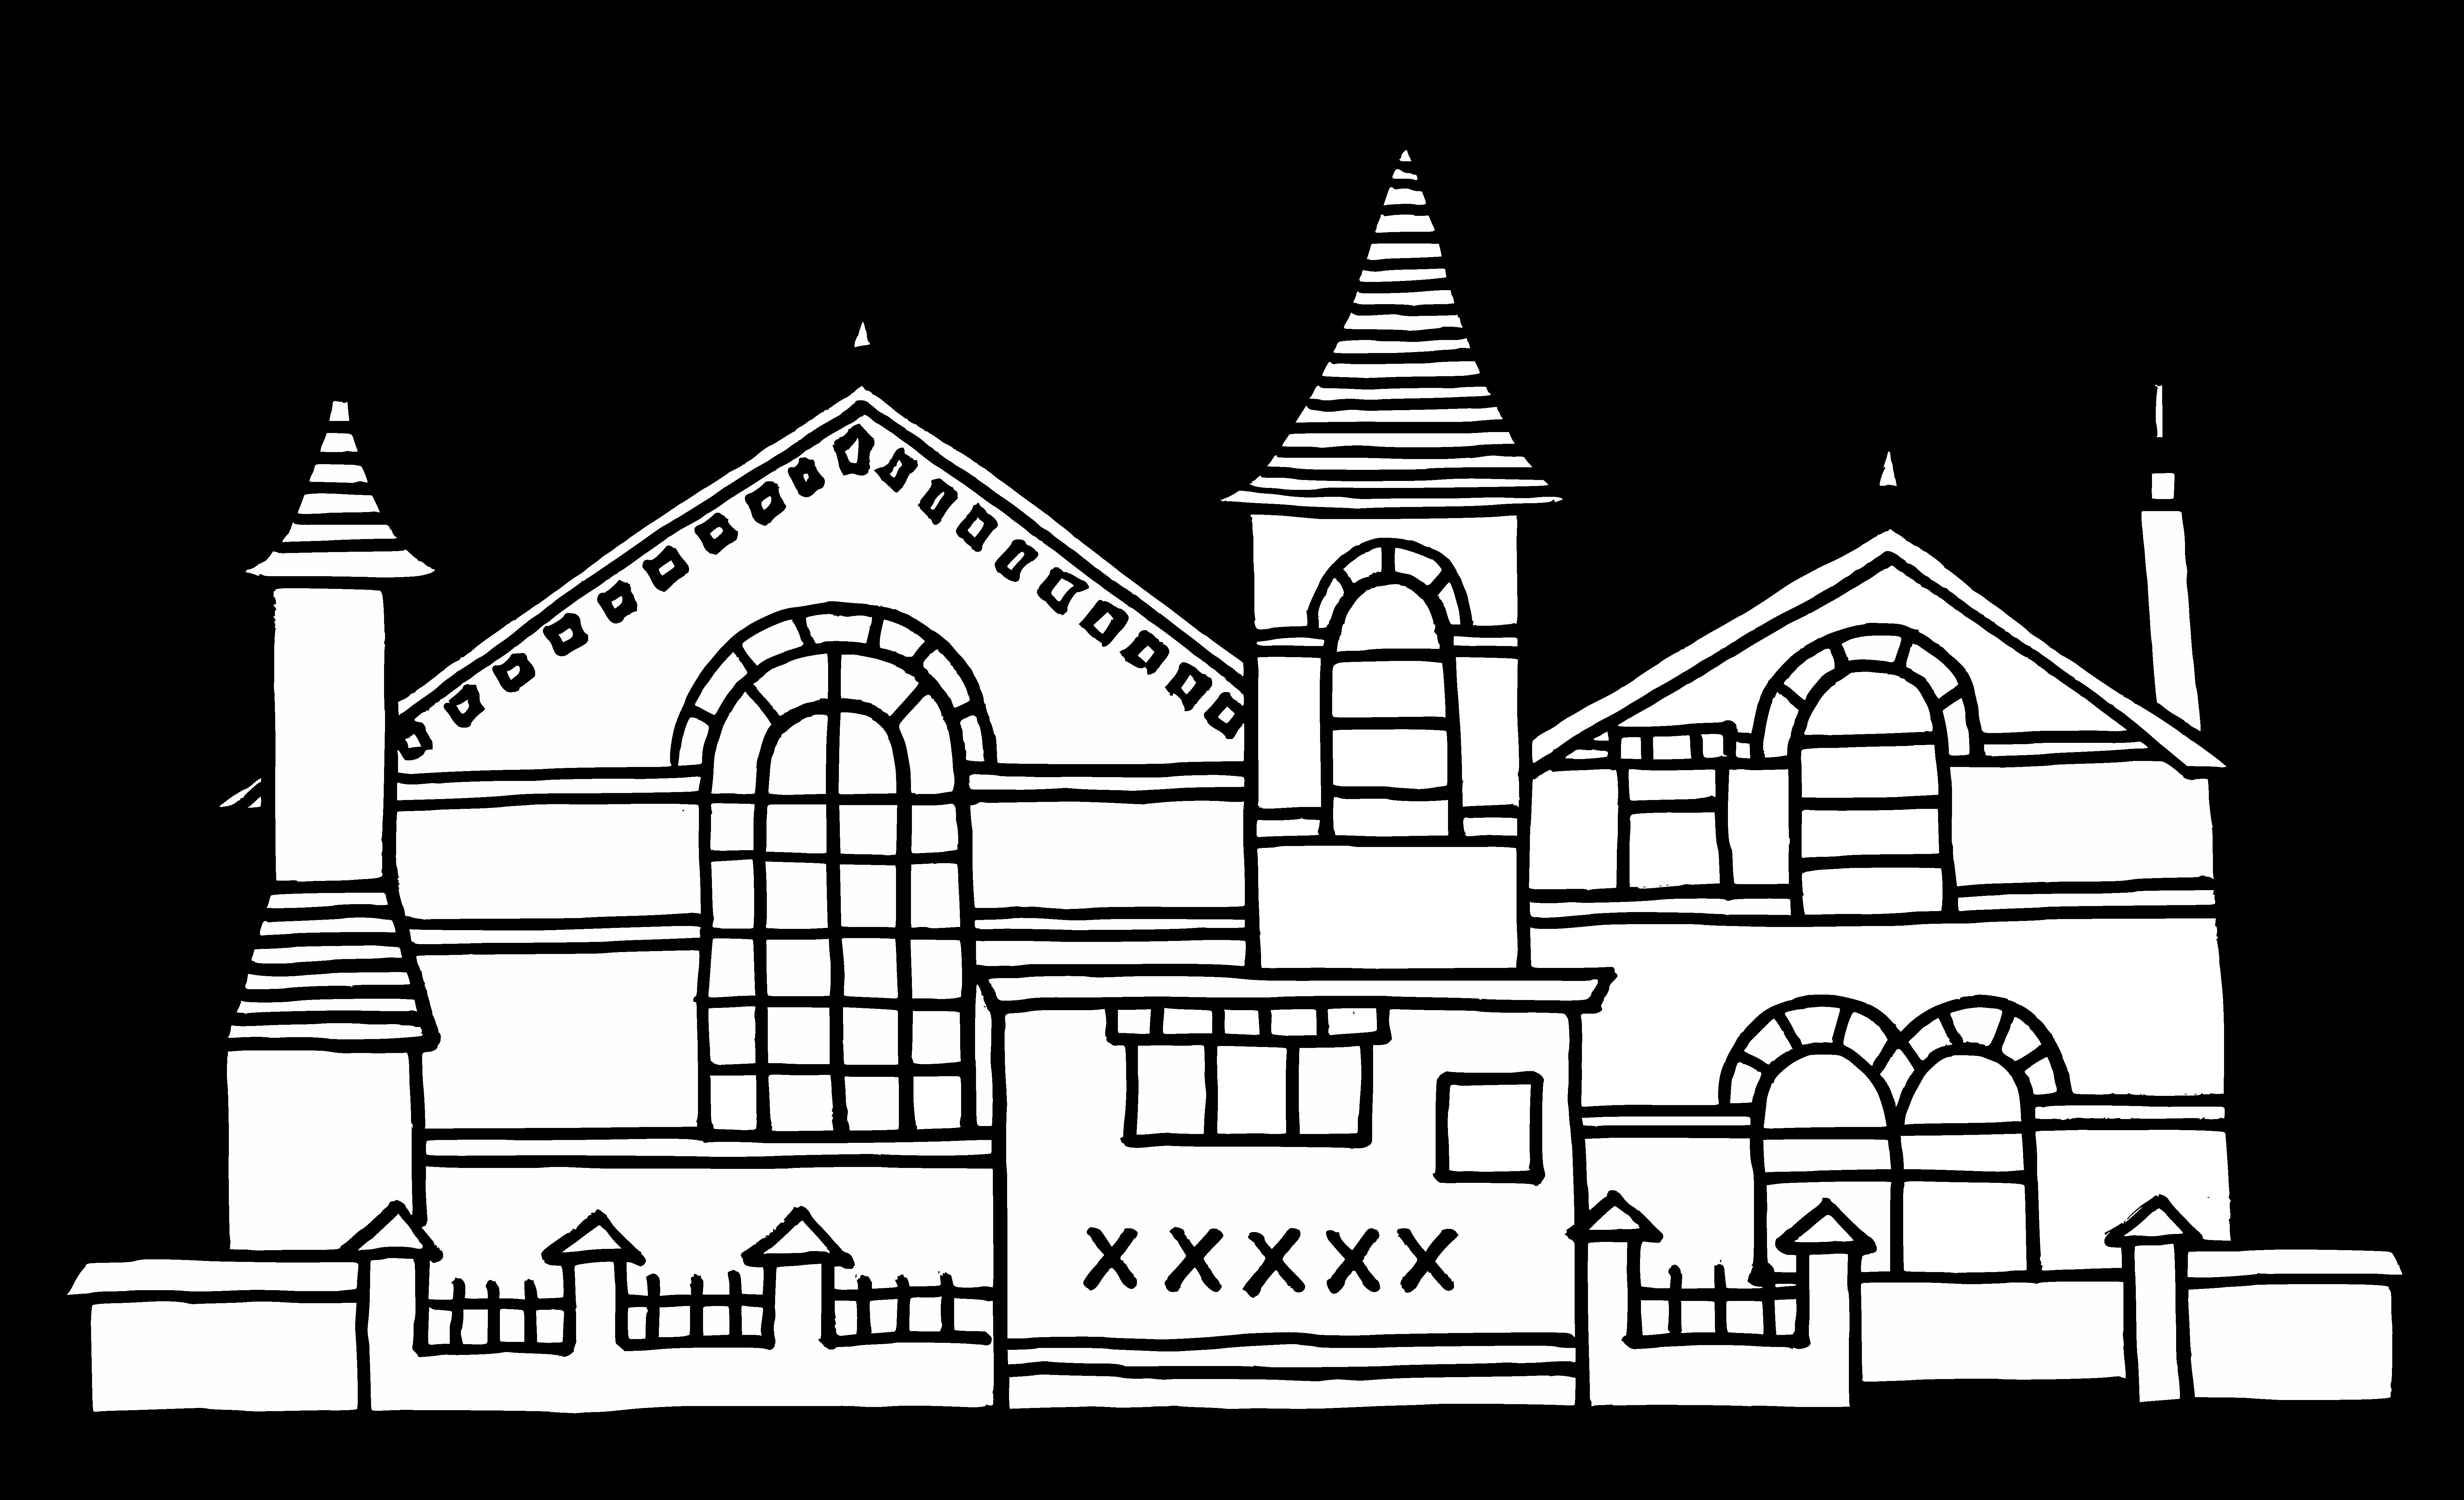 The Baxter Hall